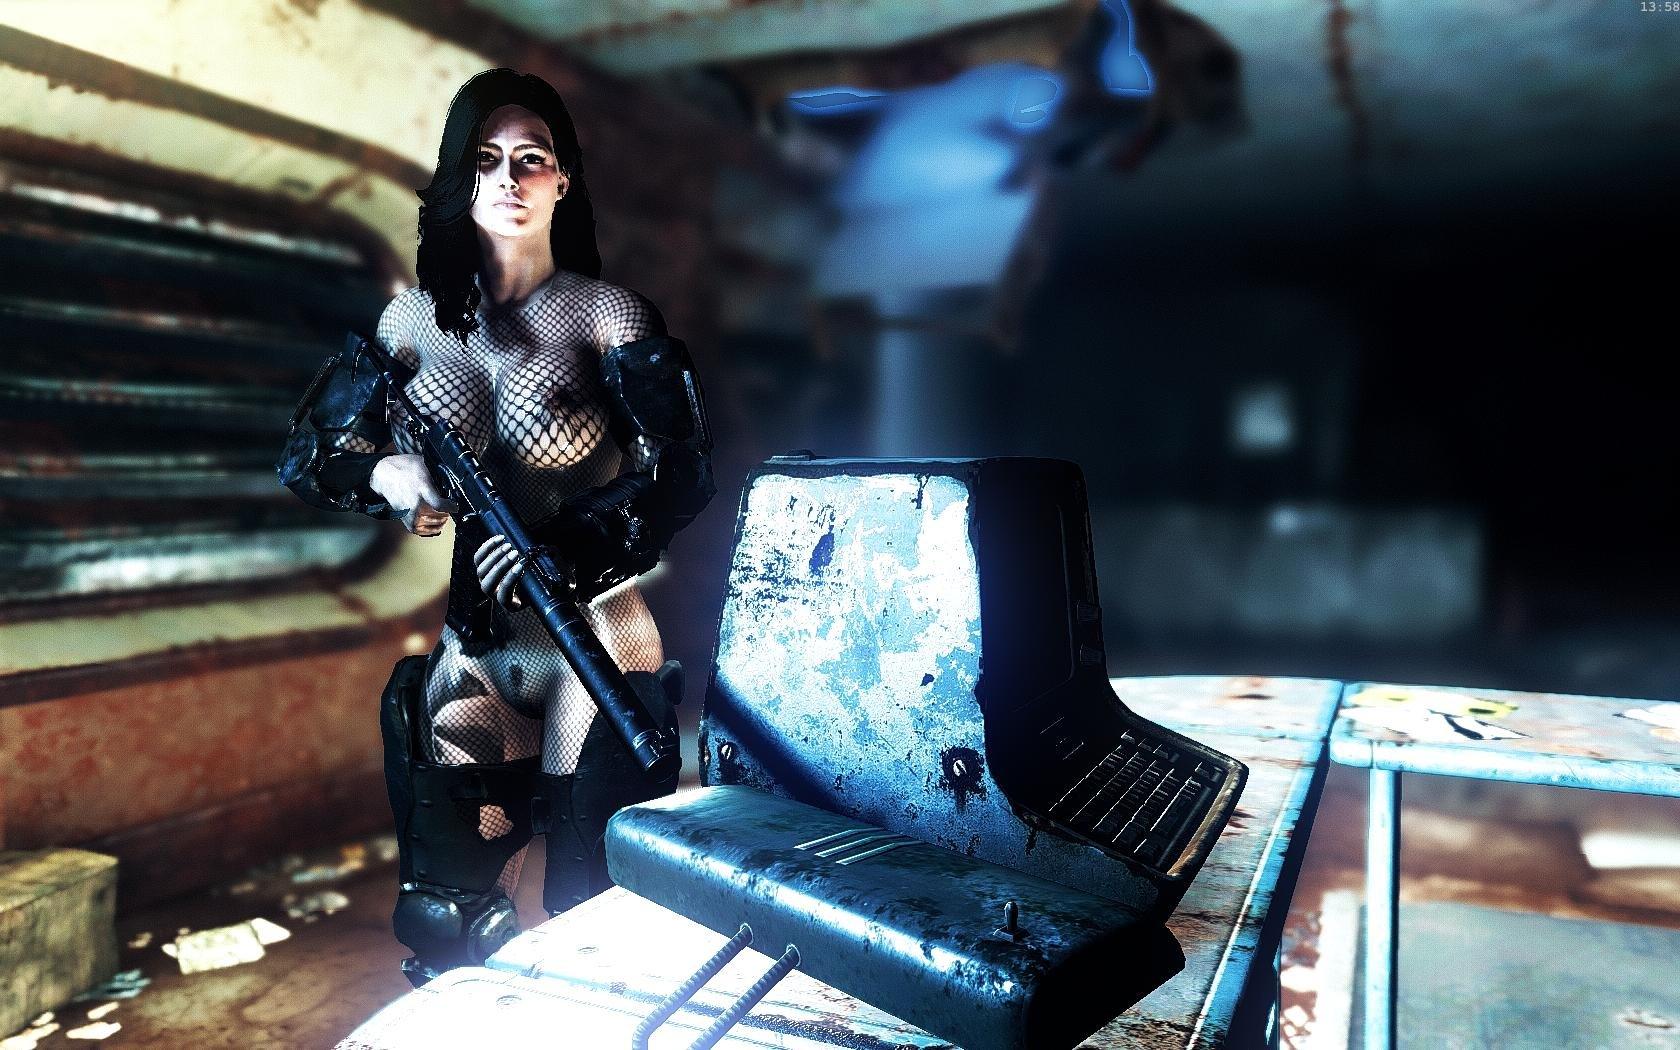 Fallout4 2019-02-03 13-58-29-36